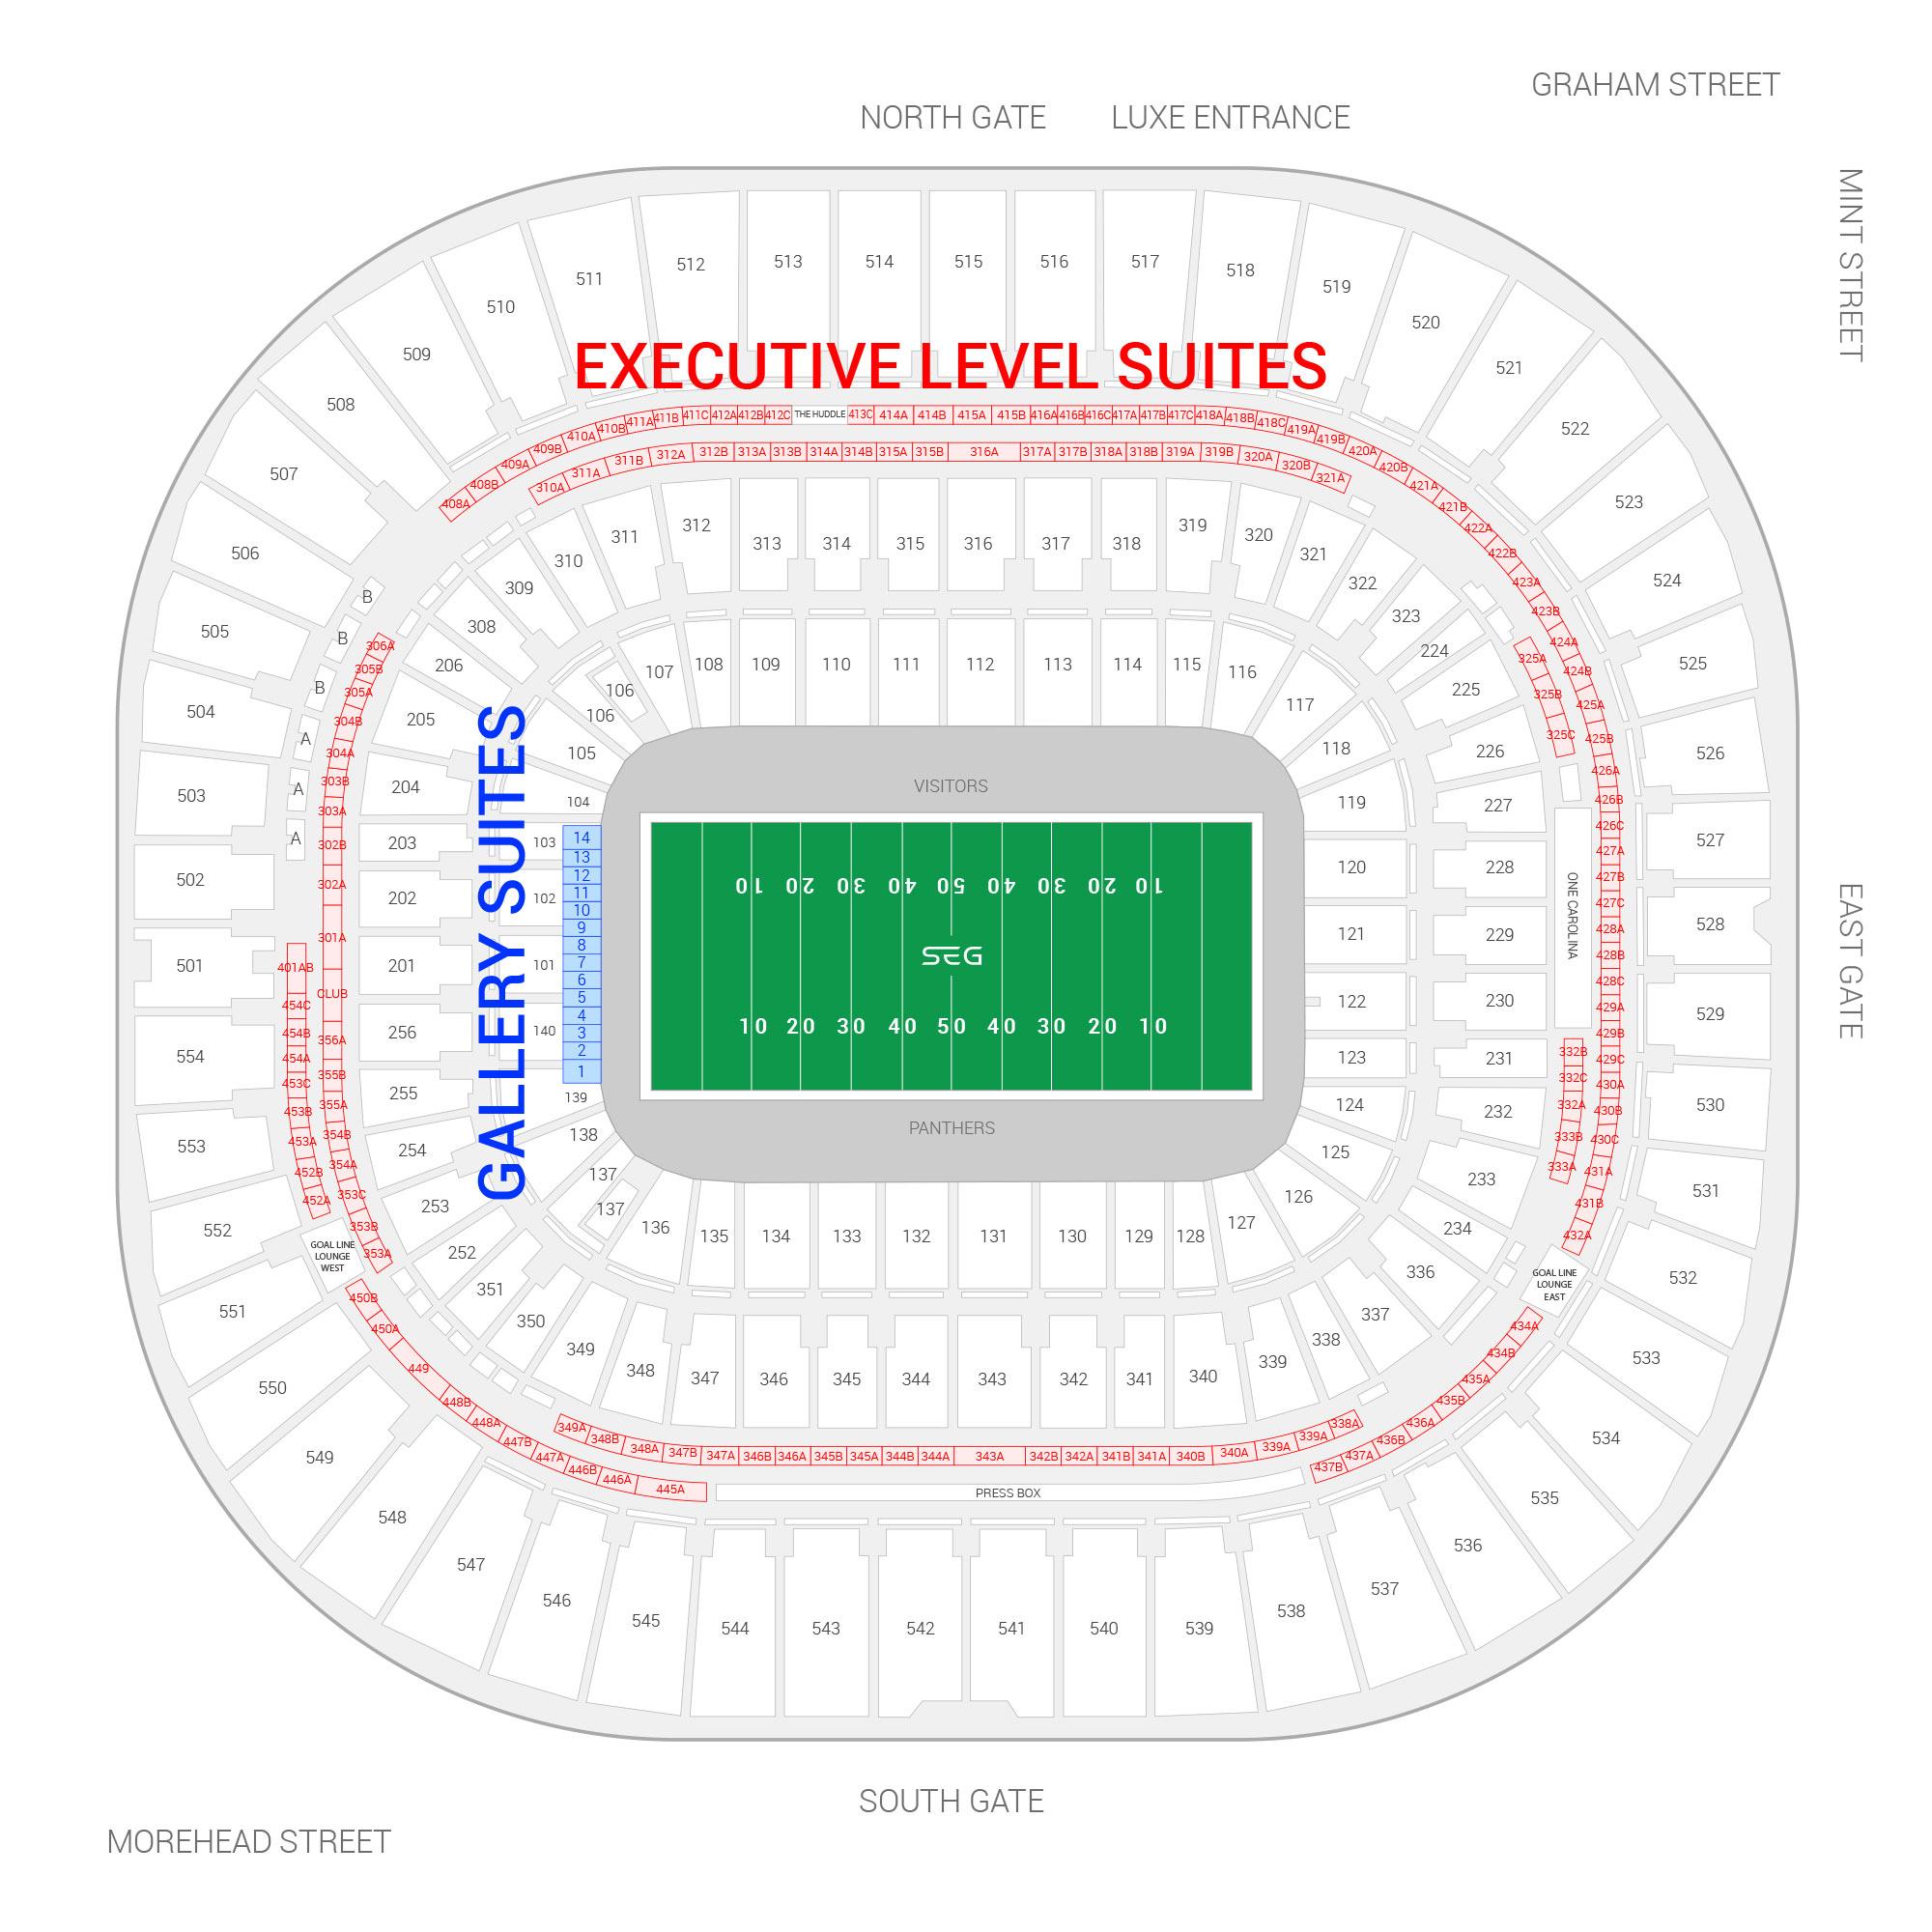 Bank of America Stadium / Carolina Panthers Suite Map and Seating Chart